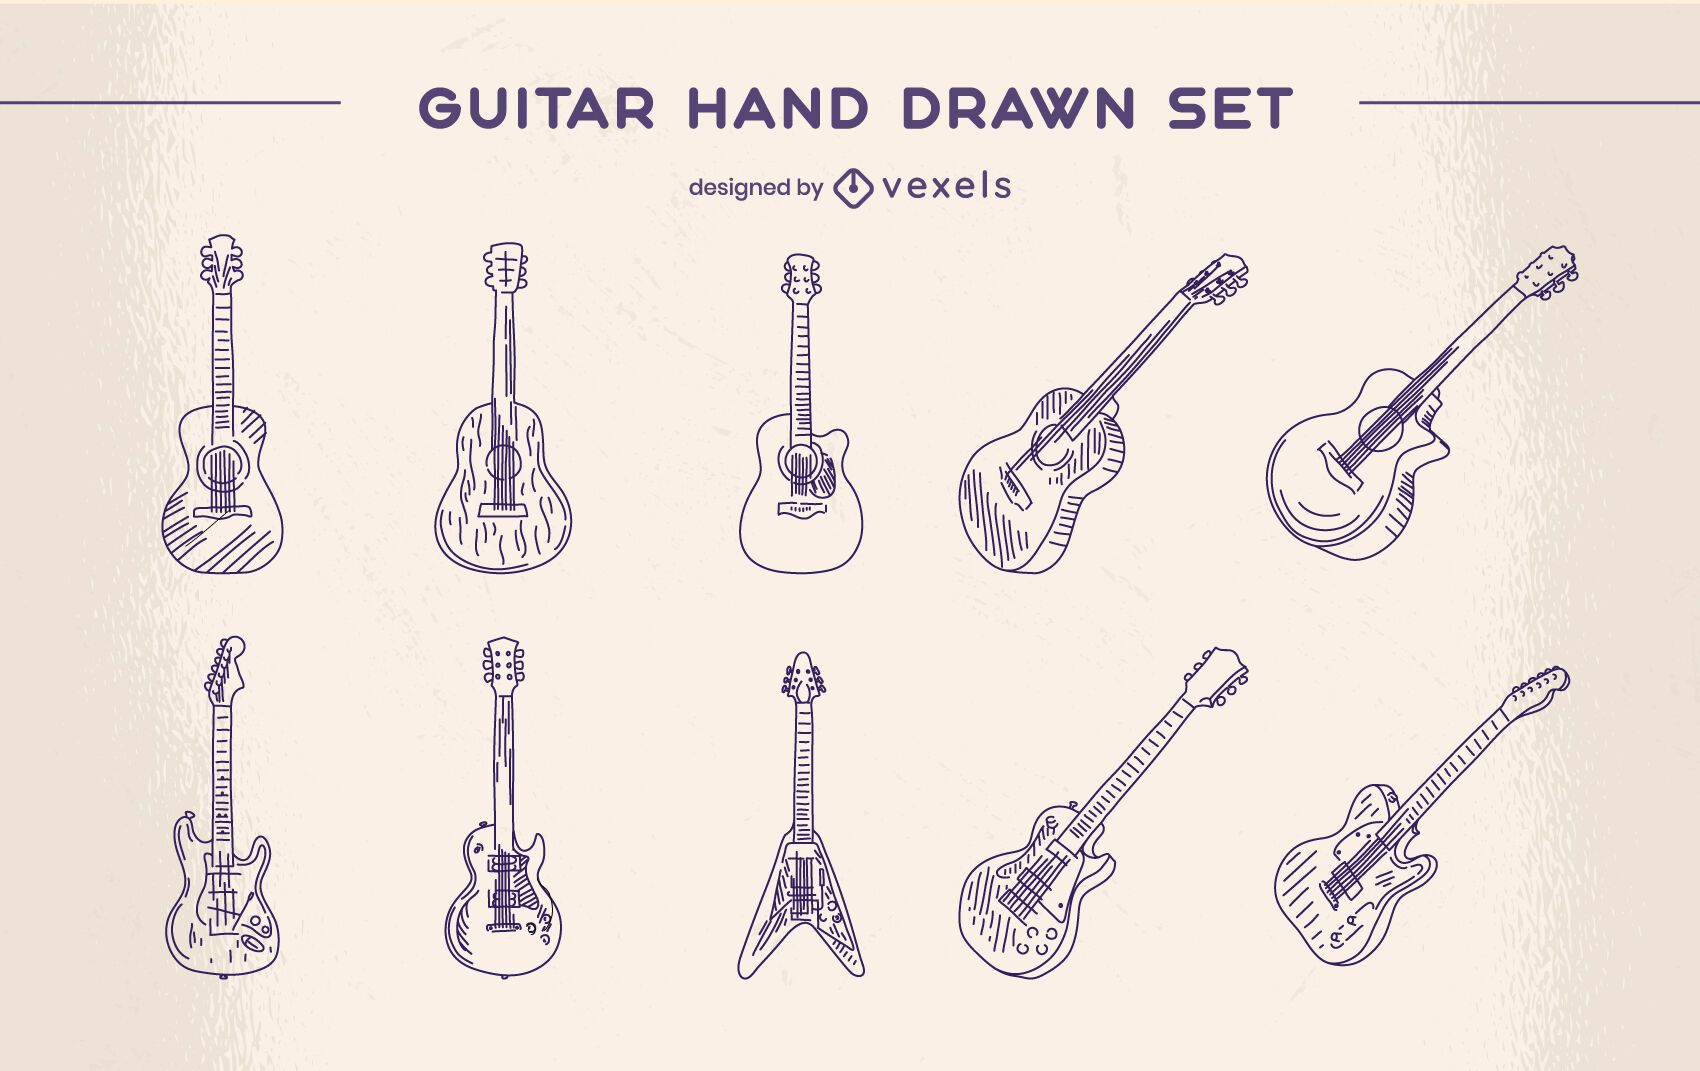 Guitarra instrumento musical clásico conjunto dibujado a mano.